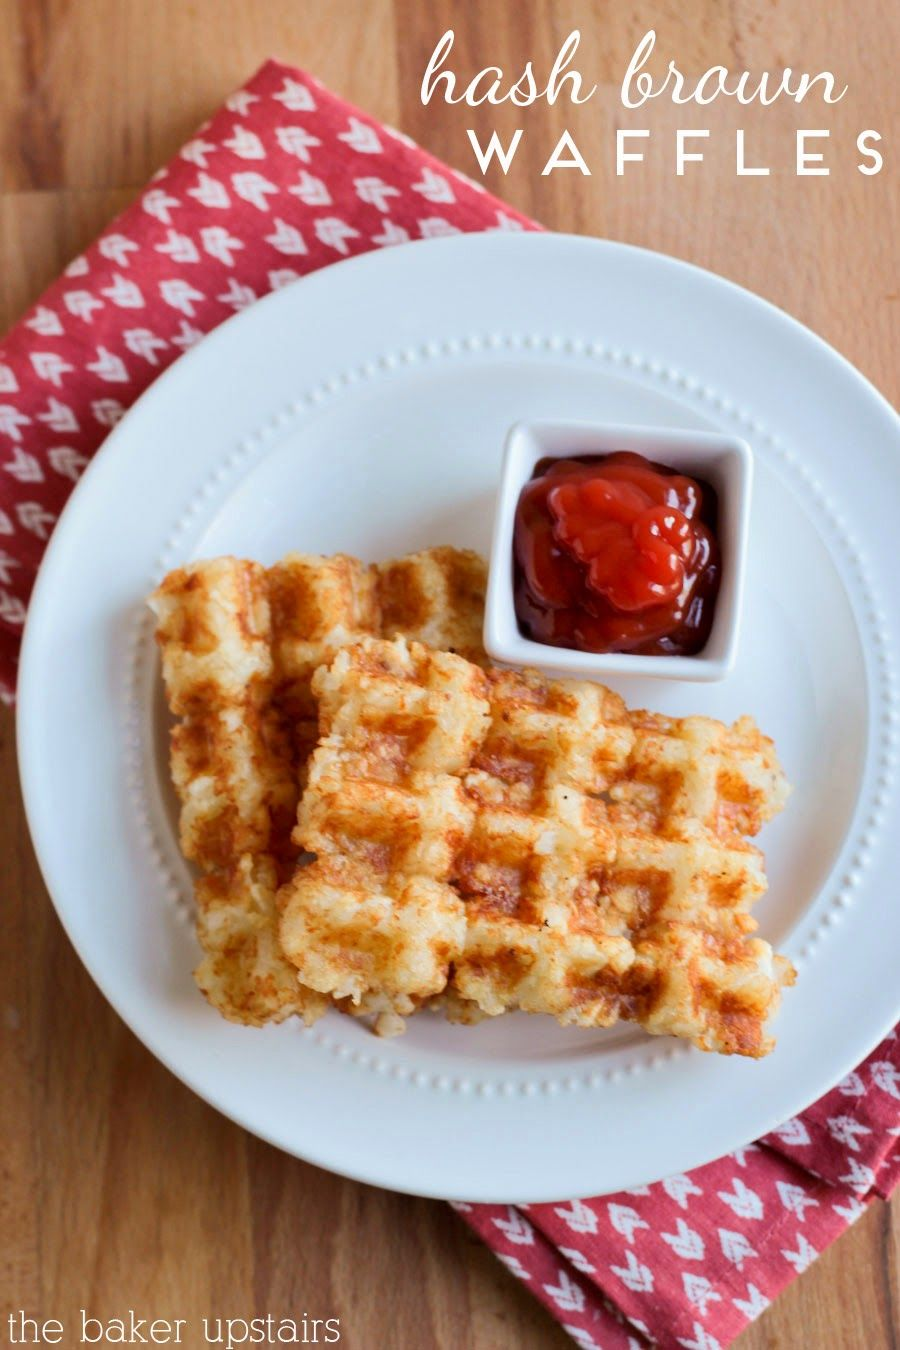 Hash brown waffles the baker upstairs breakfast